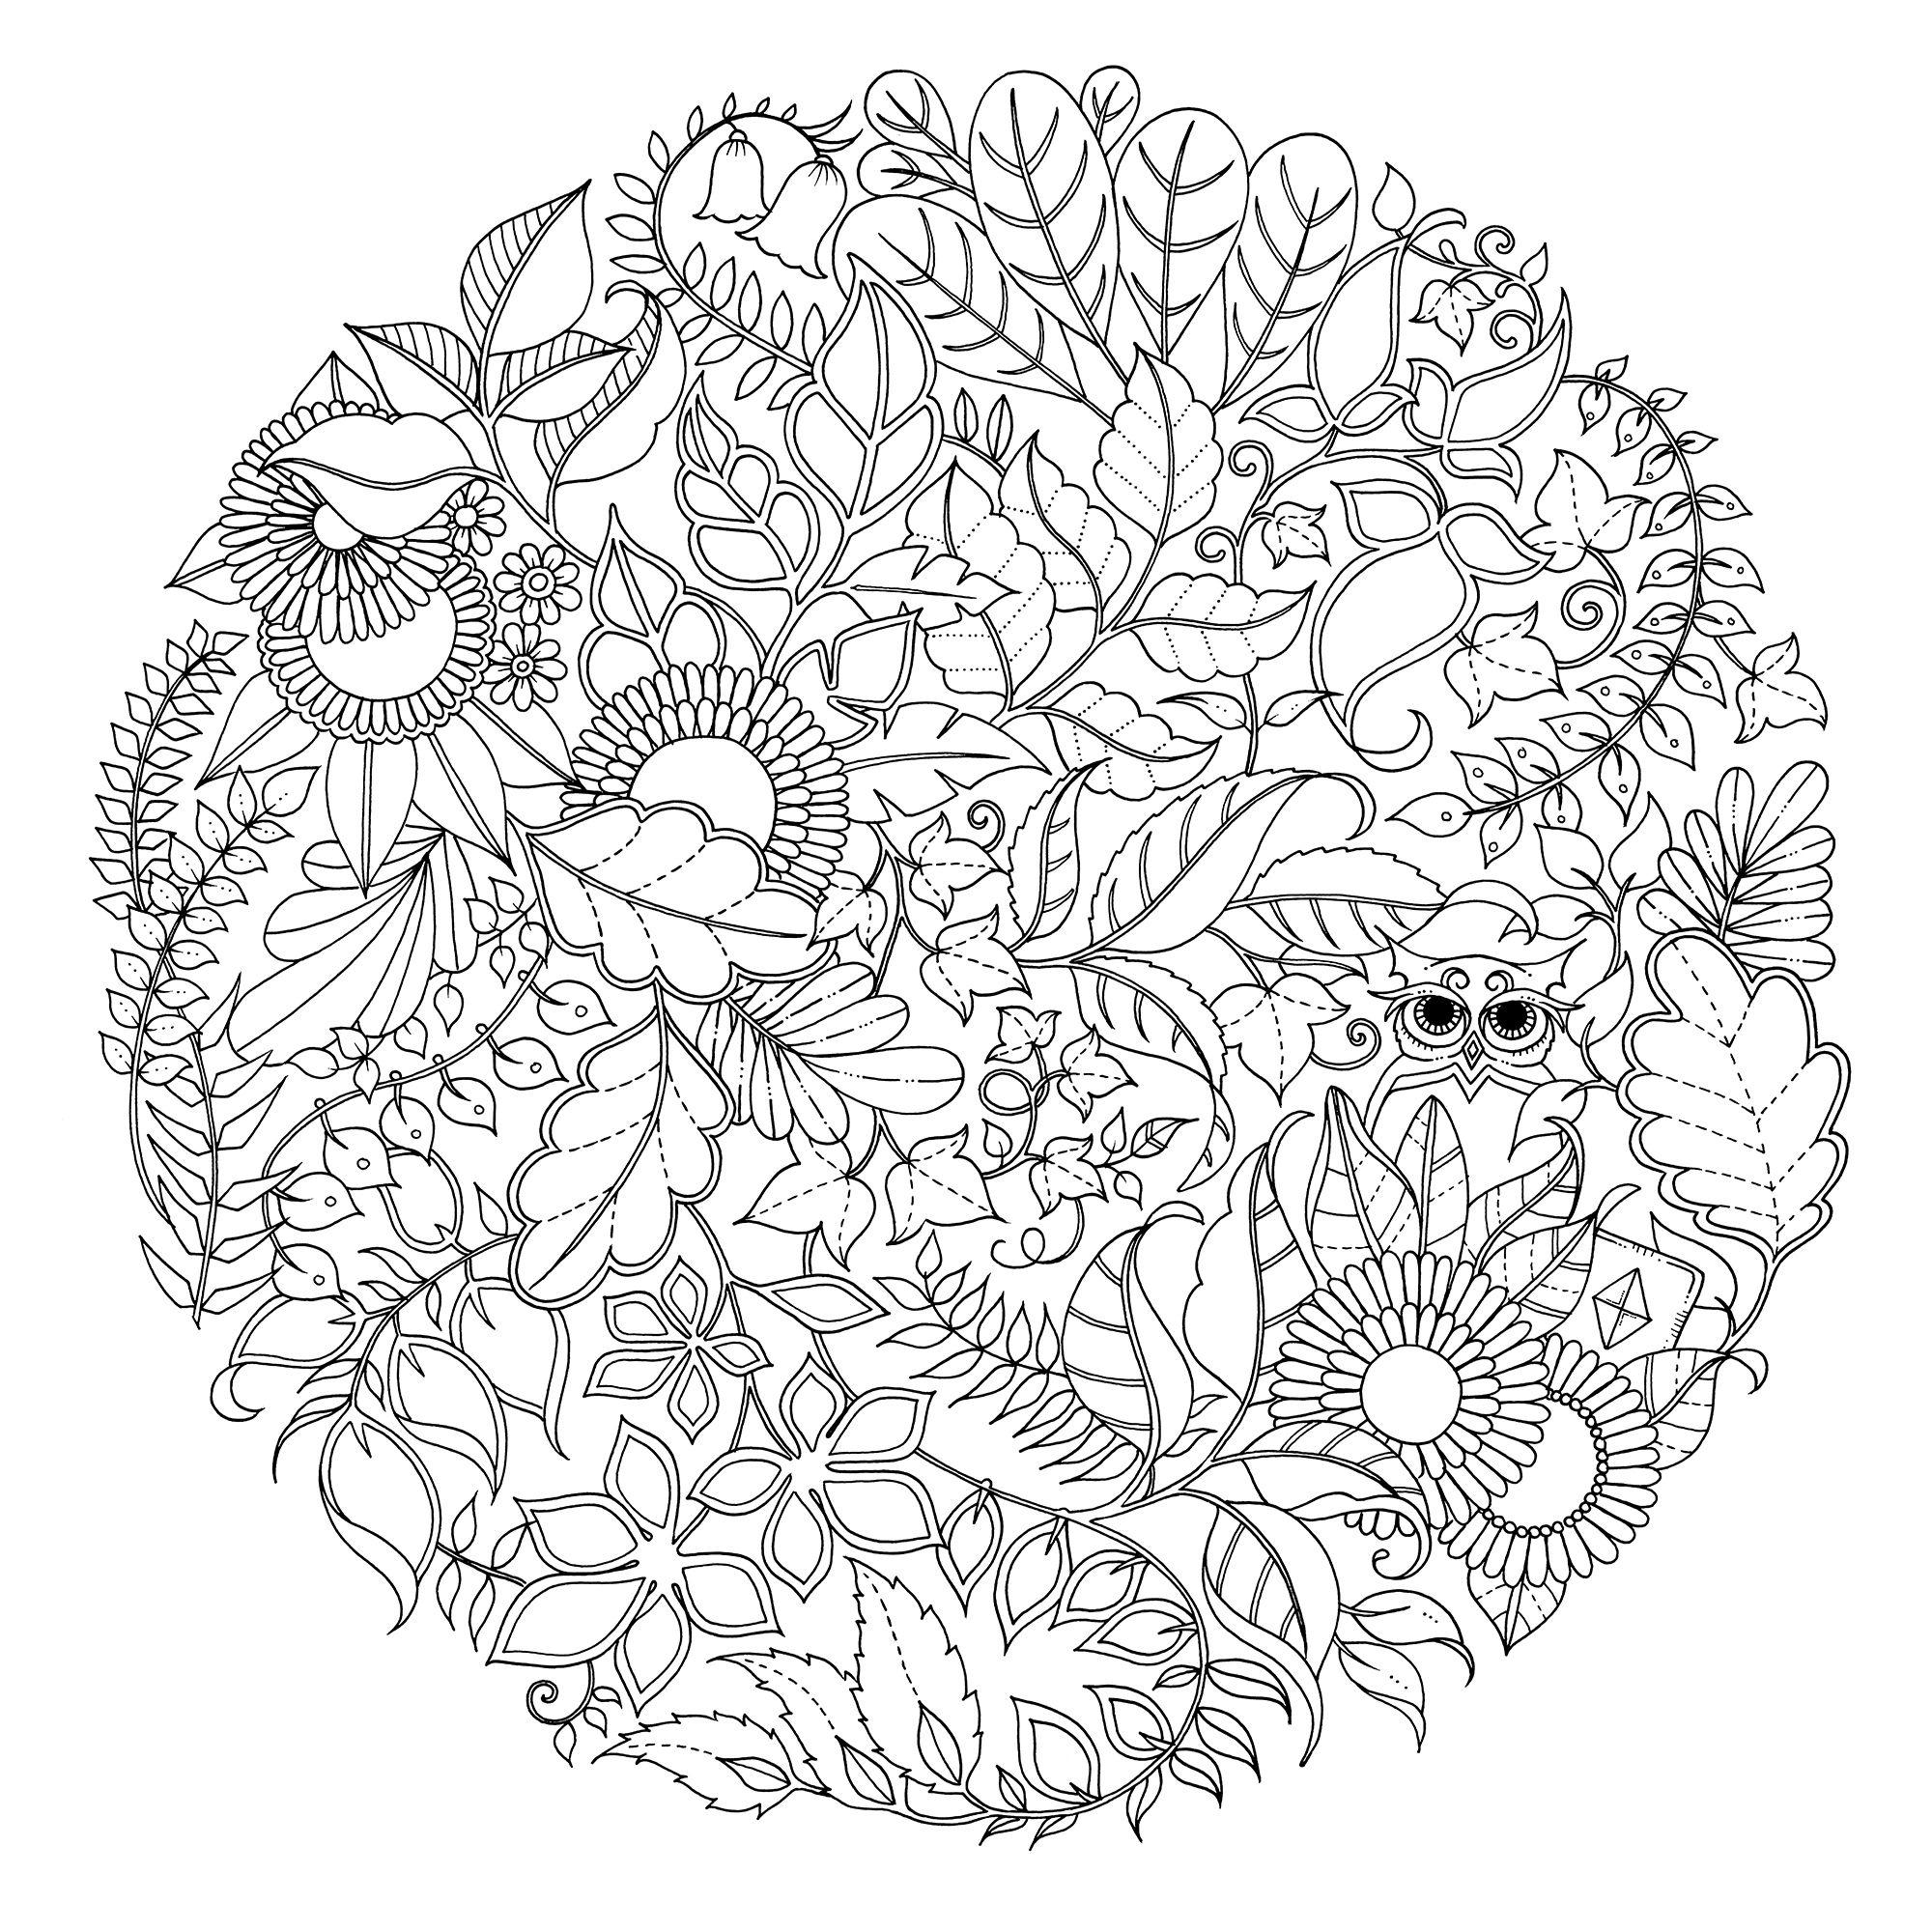 Wald-mandala  Malvorlagen, Muster malvorlagen, Mandala ausmalen